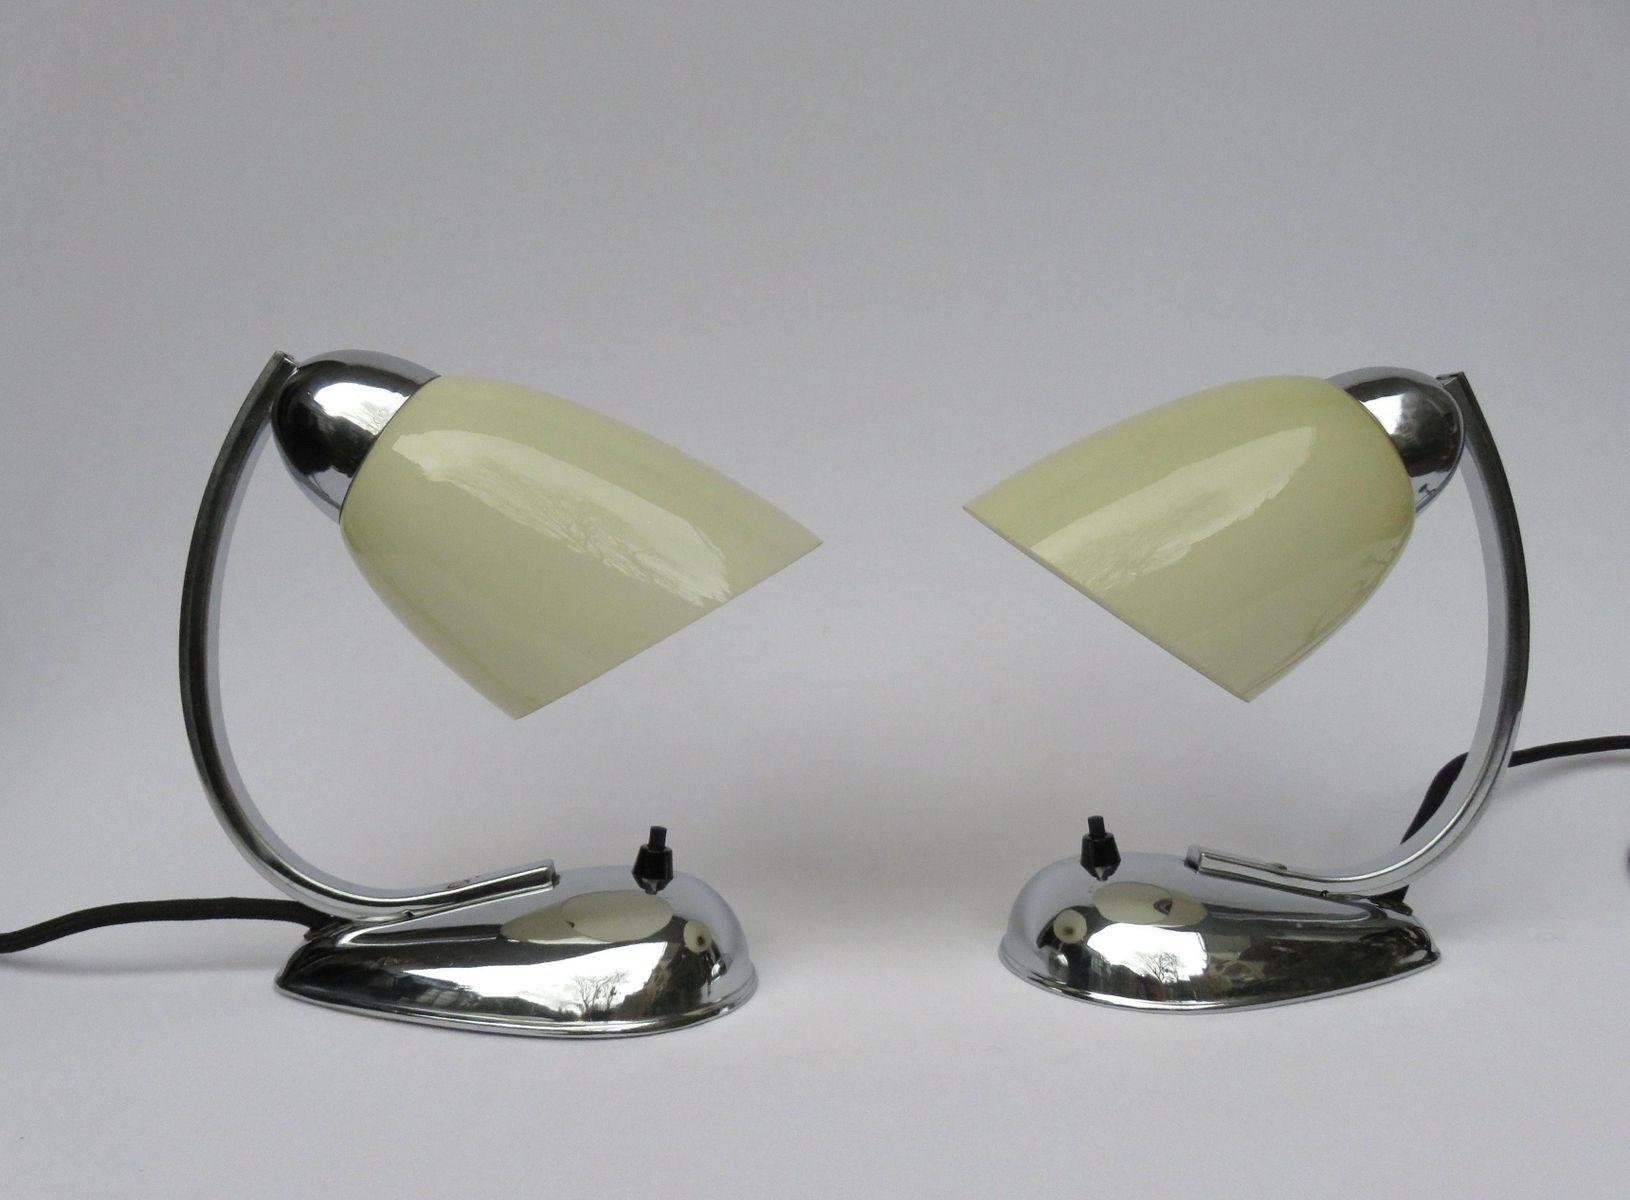 Tischlampe Led Modern Led Touch Nachttischlampe Led Lampen Kaufen Munchen Tischlampe 70 Cm Italienische Tischleucht Nachttischlampe Lampe Lampen Kaufen